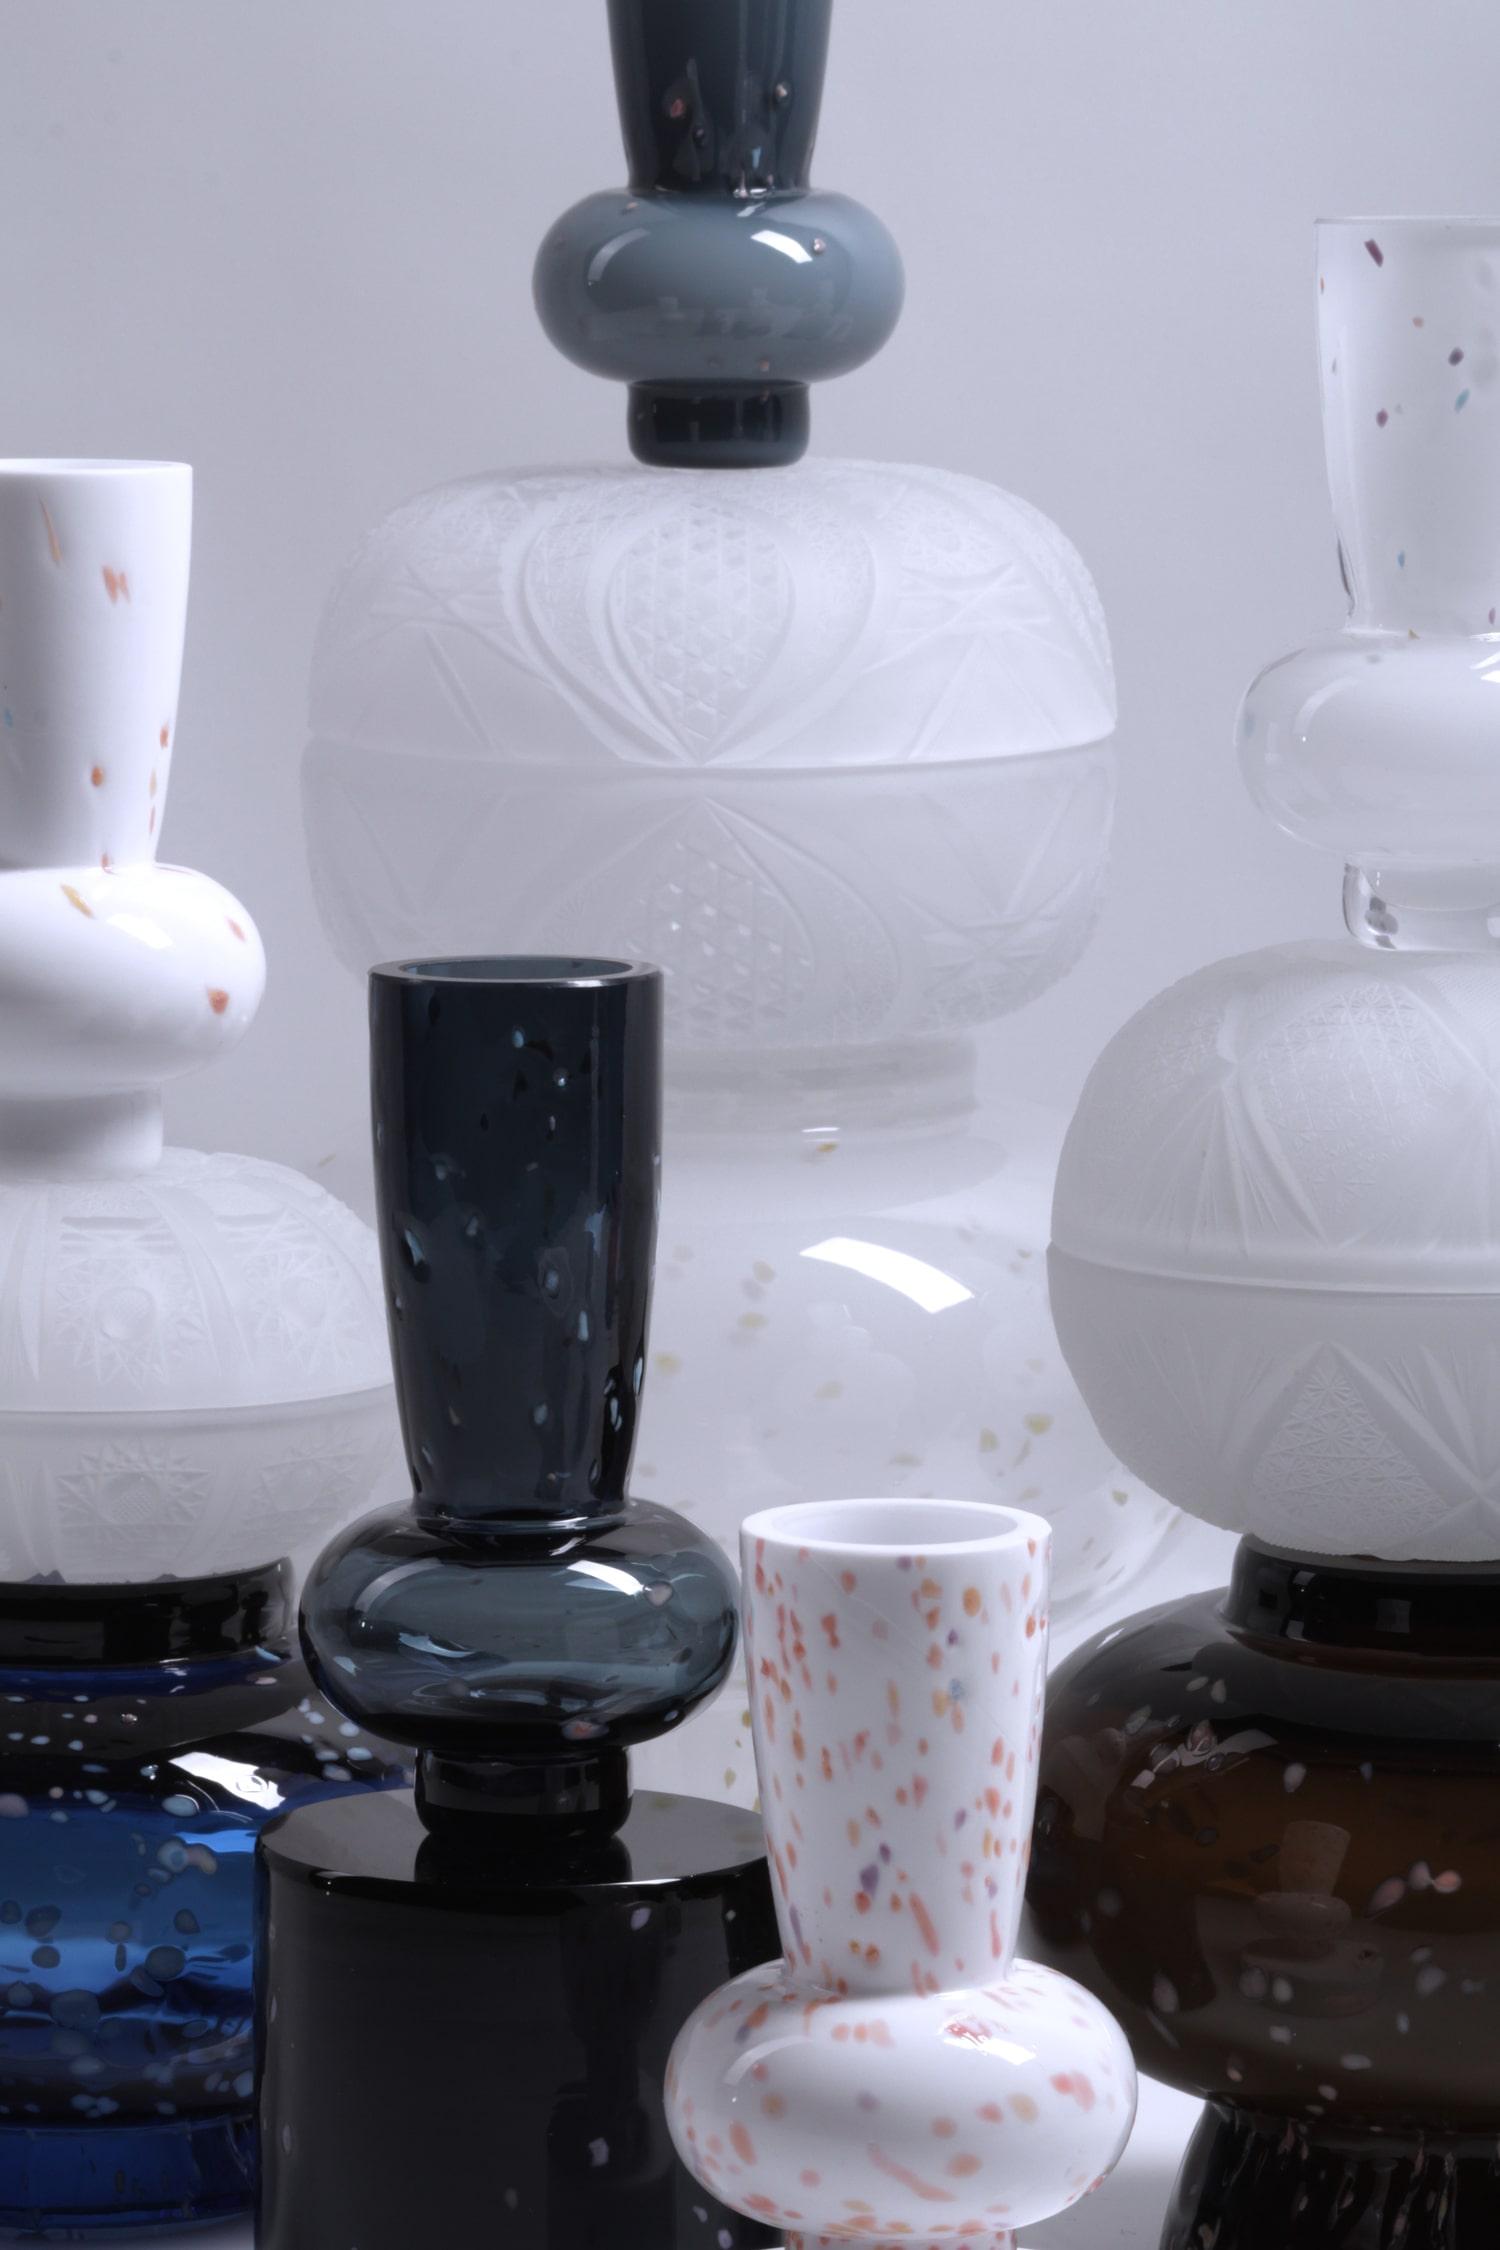 heritage-contemporary-glass-art-objects-atelier-photos-jiri-krejcirik-